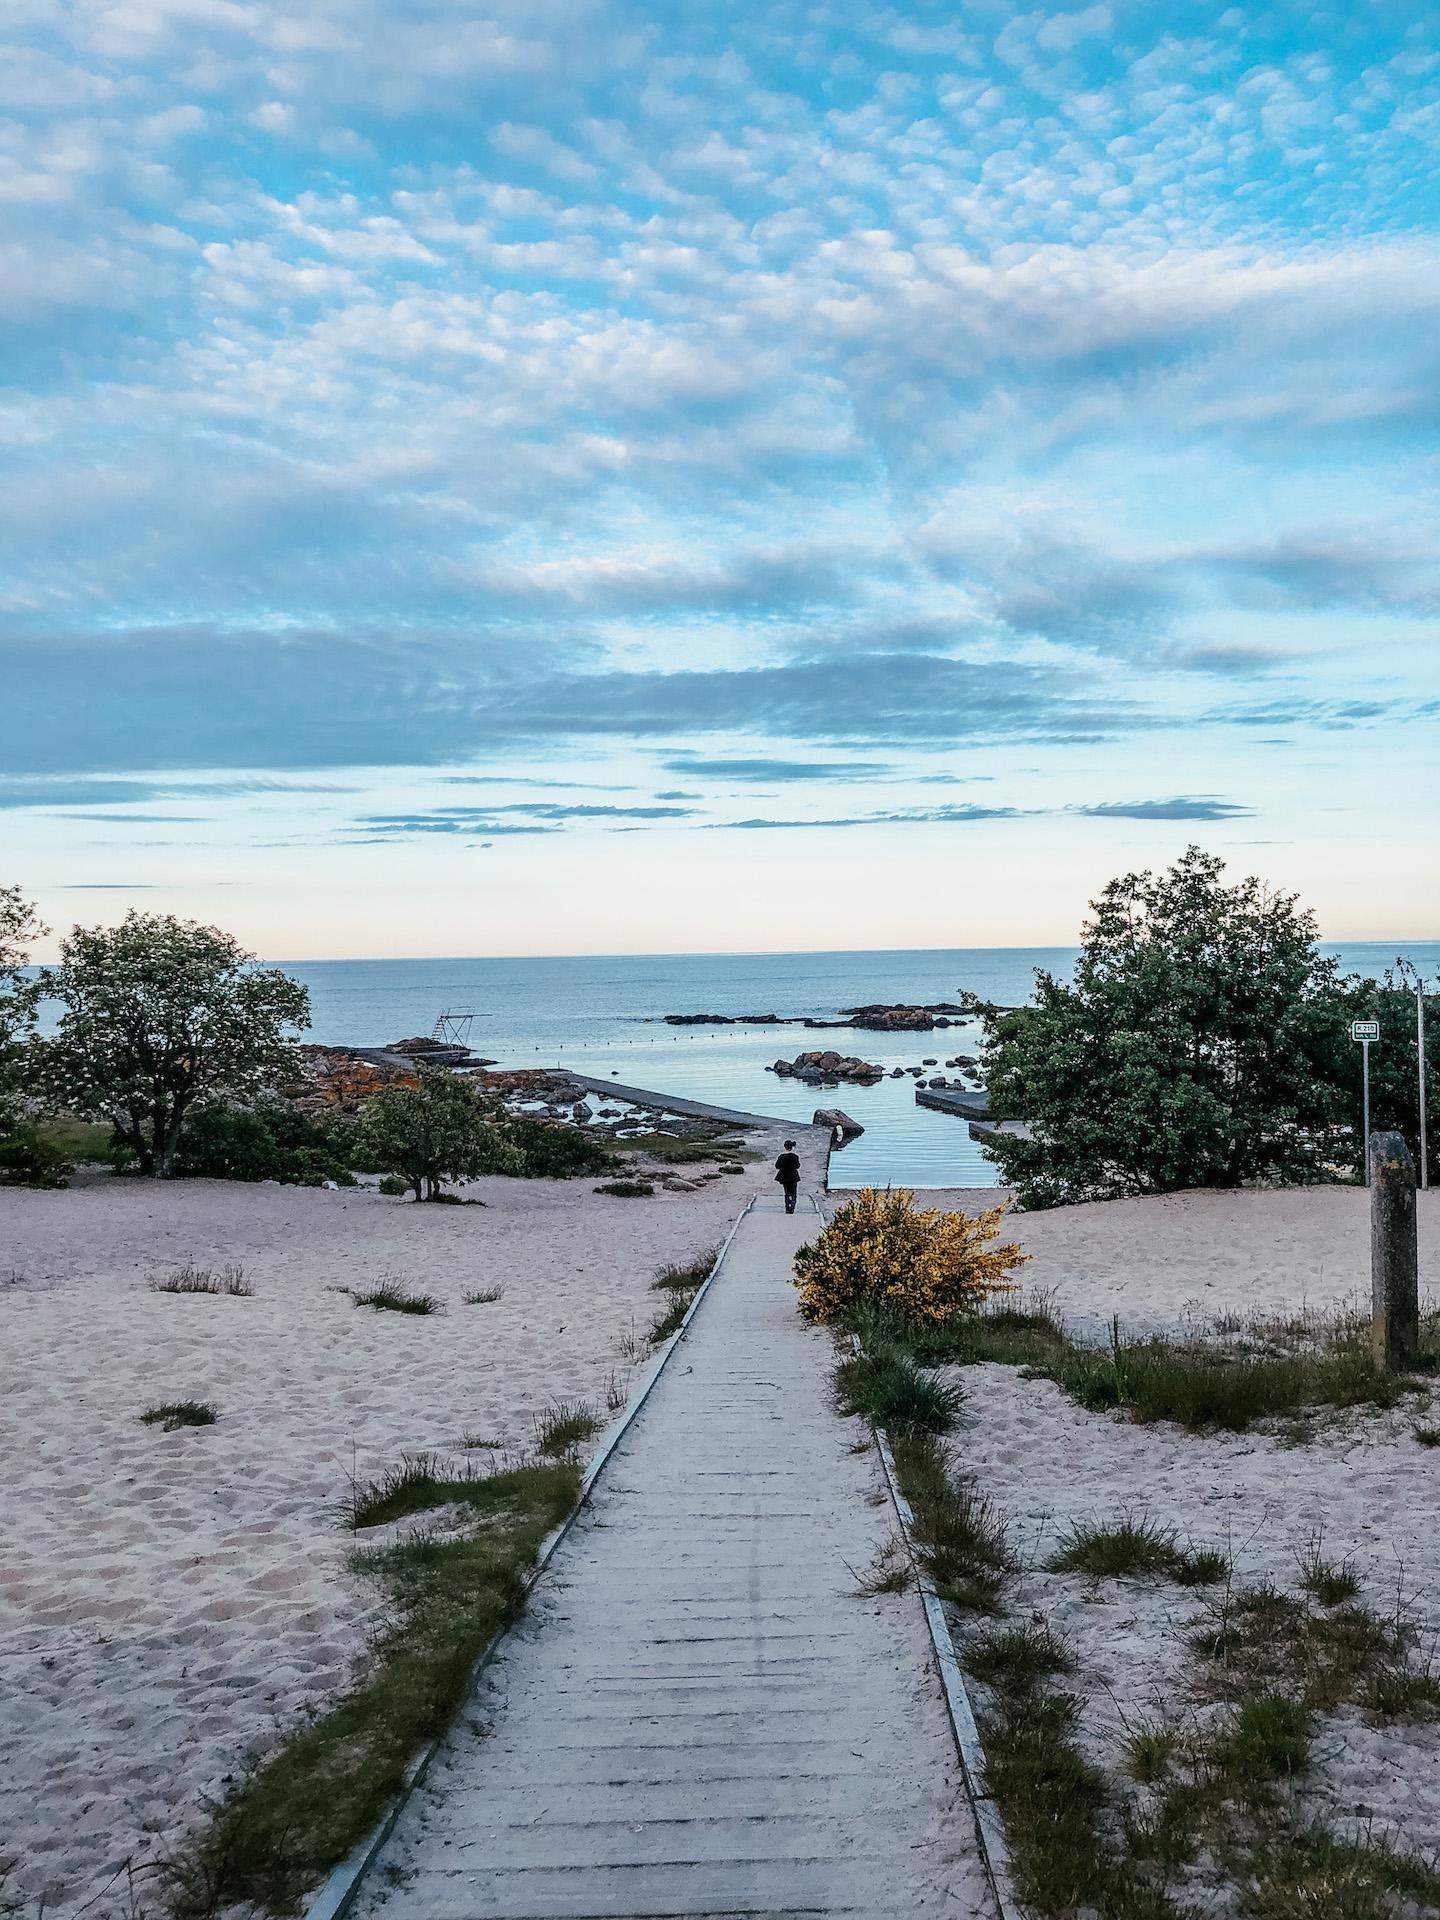 bornholm_outdoor_klippeklatring_opalsøen_mountainbike_rappelling_urbannotes.dk_conni lagergreen schmidt